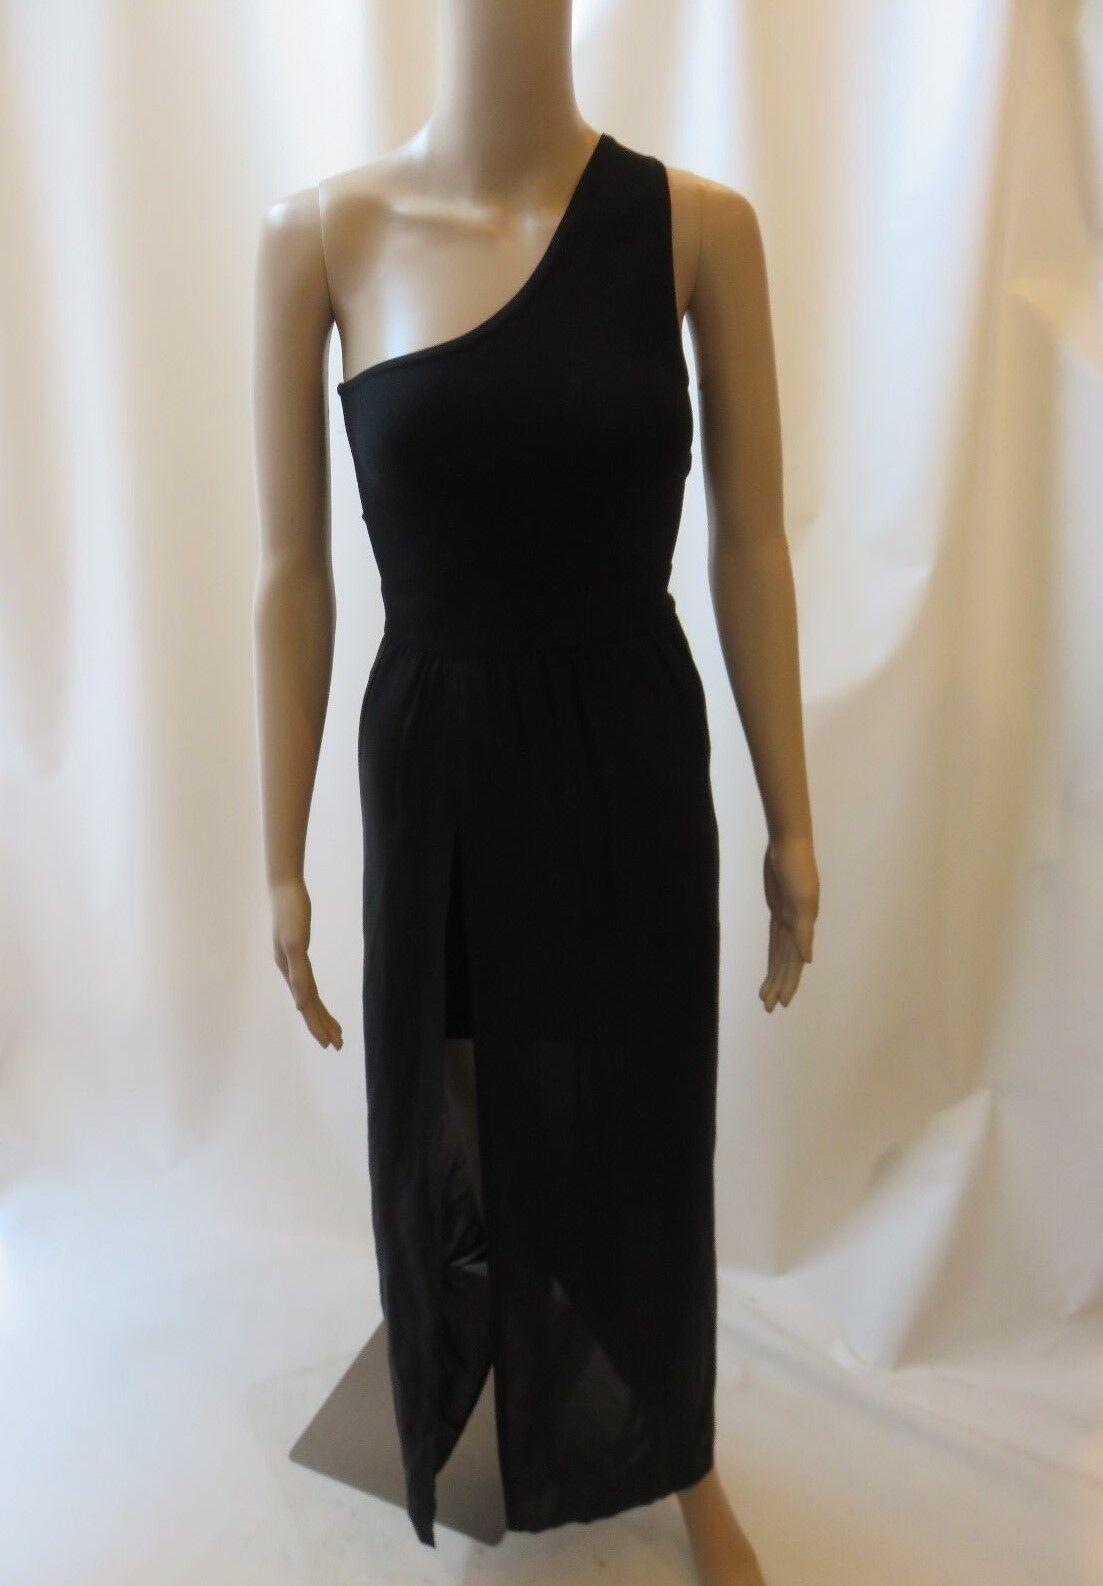 Stretta Jessica schwarz One Shouler Form Fitting Illusion Dress Größe XS